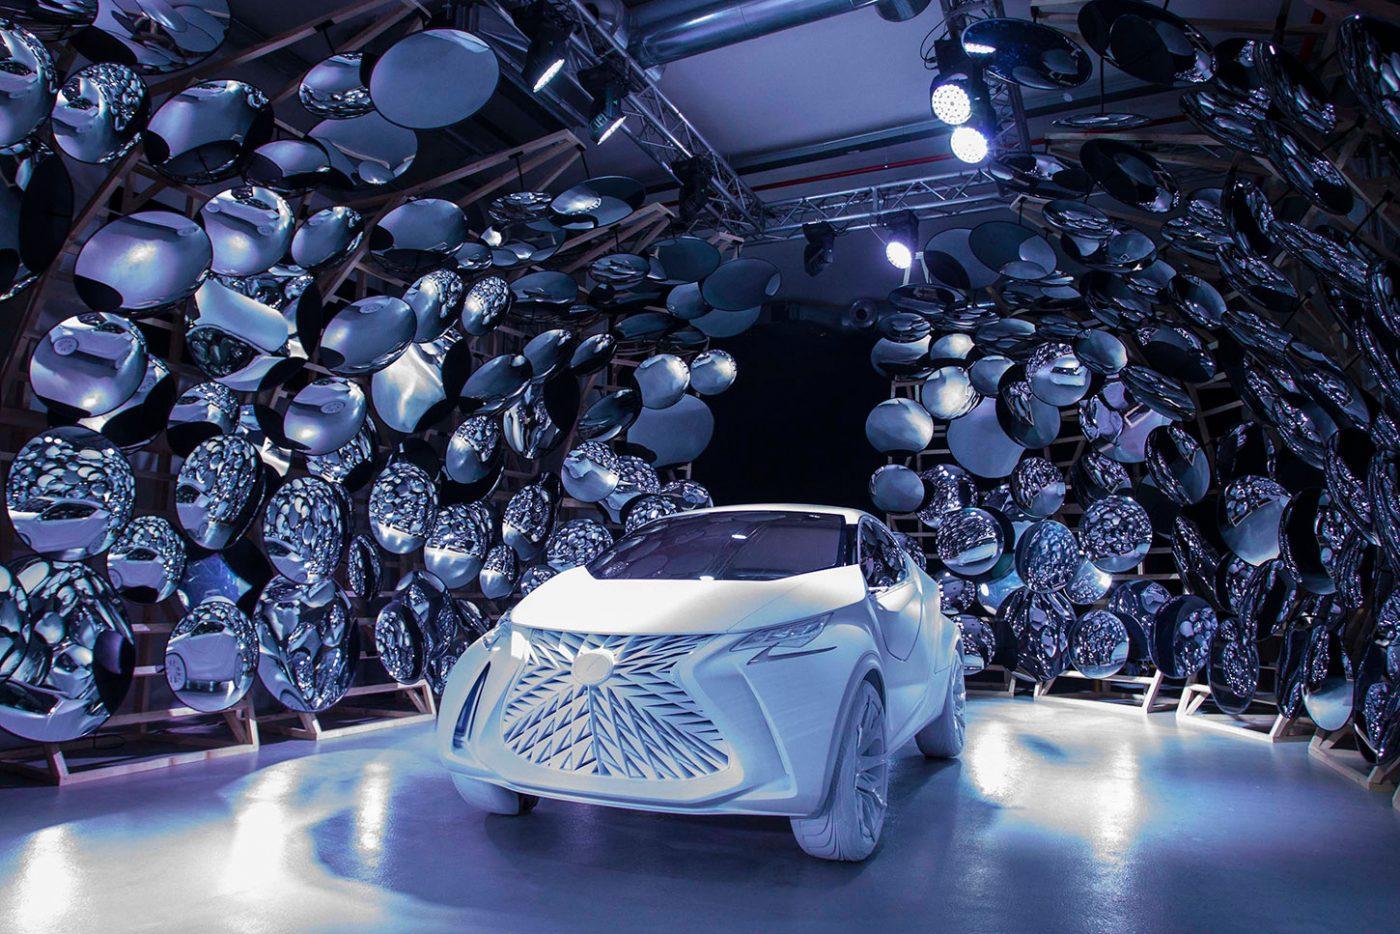 Lexus-LF-SA-Concept-Milan-Design-Week-2